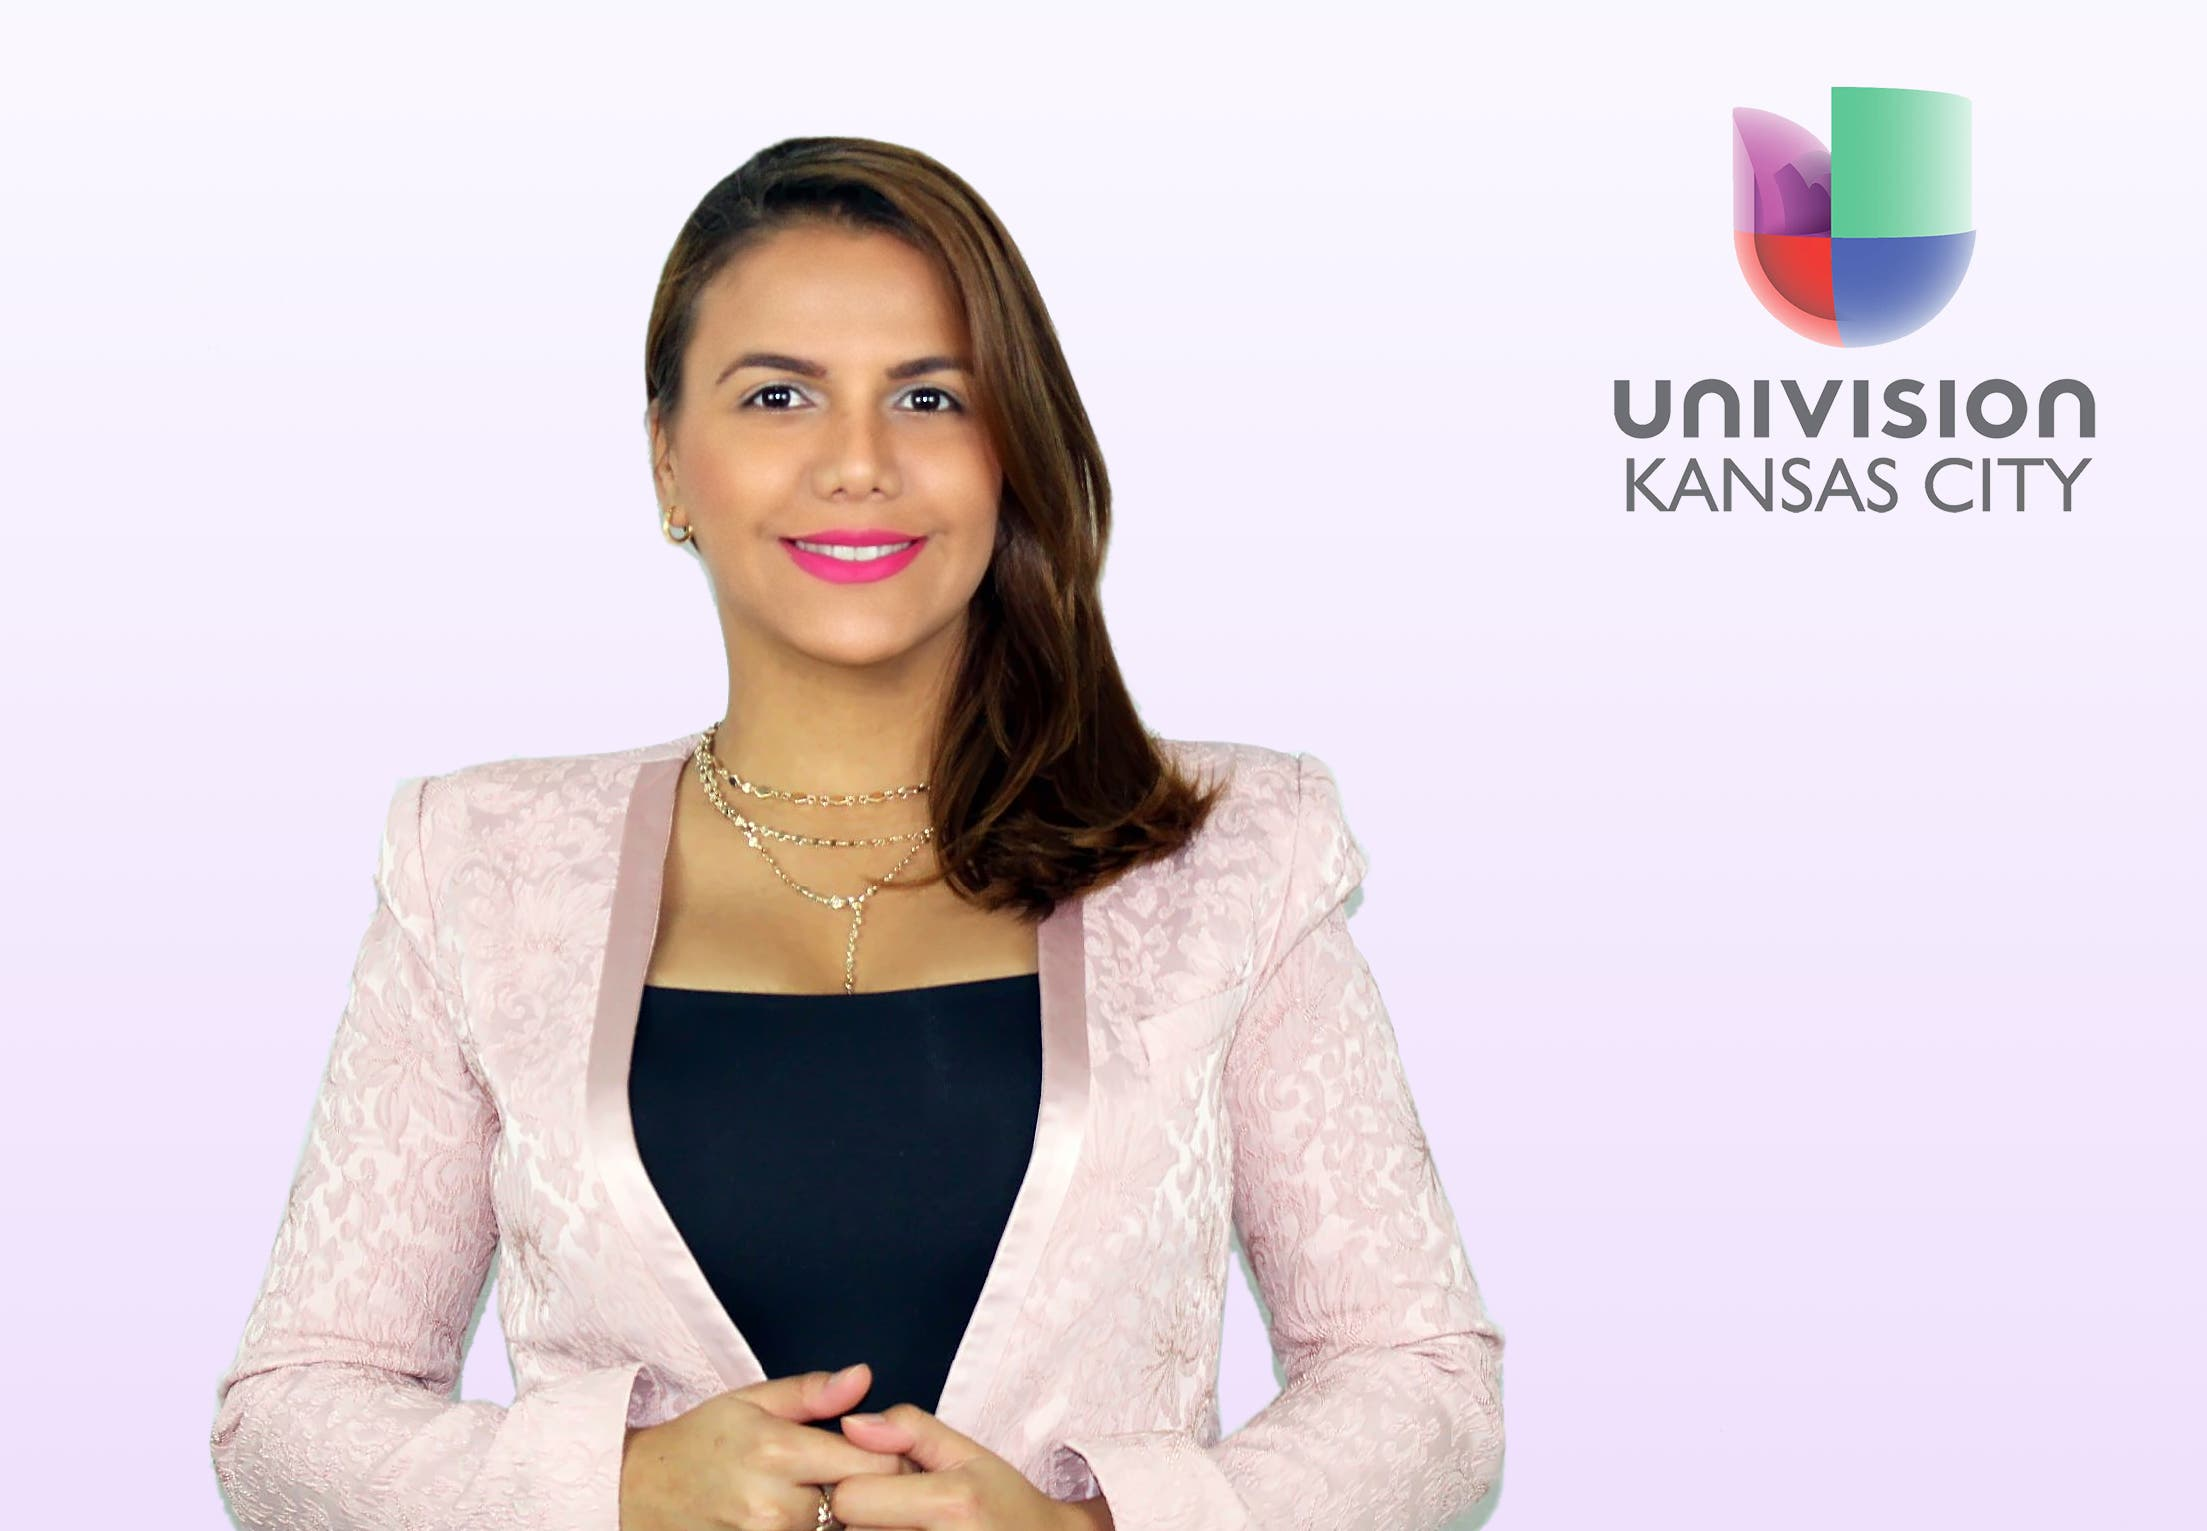 Periodista Paloma Martínez, otra dominicana que se une a Univisión